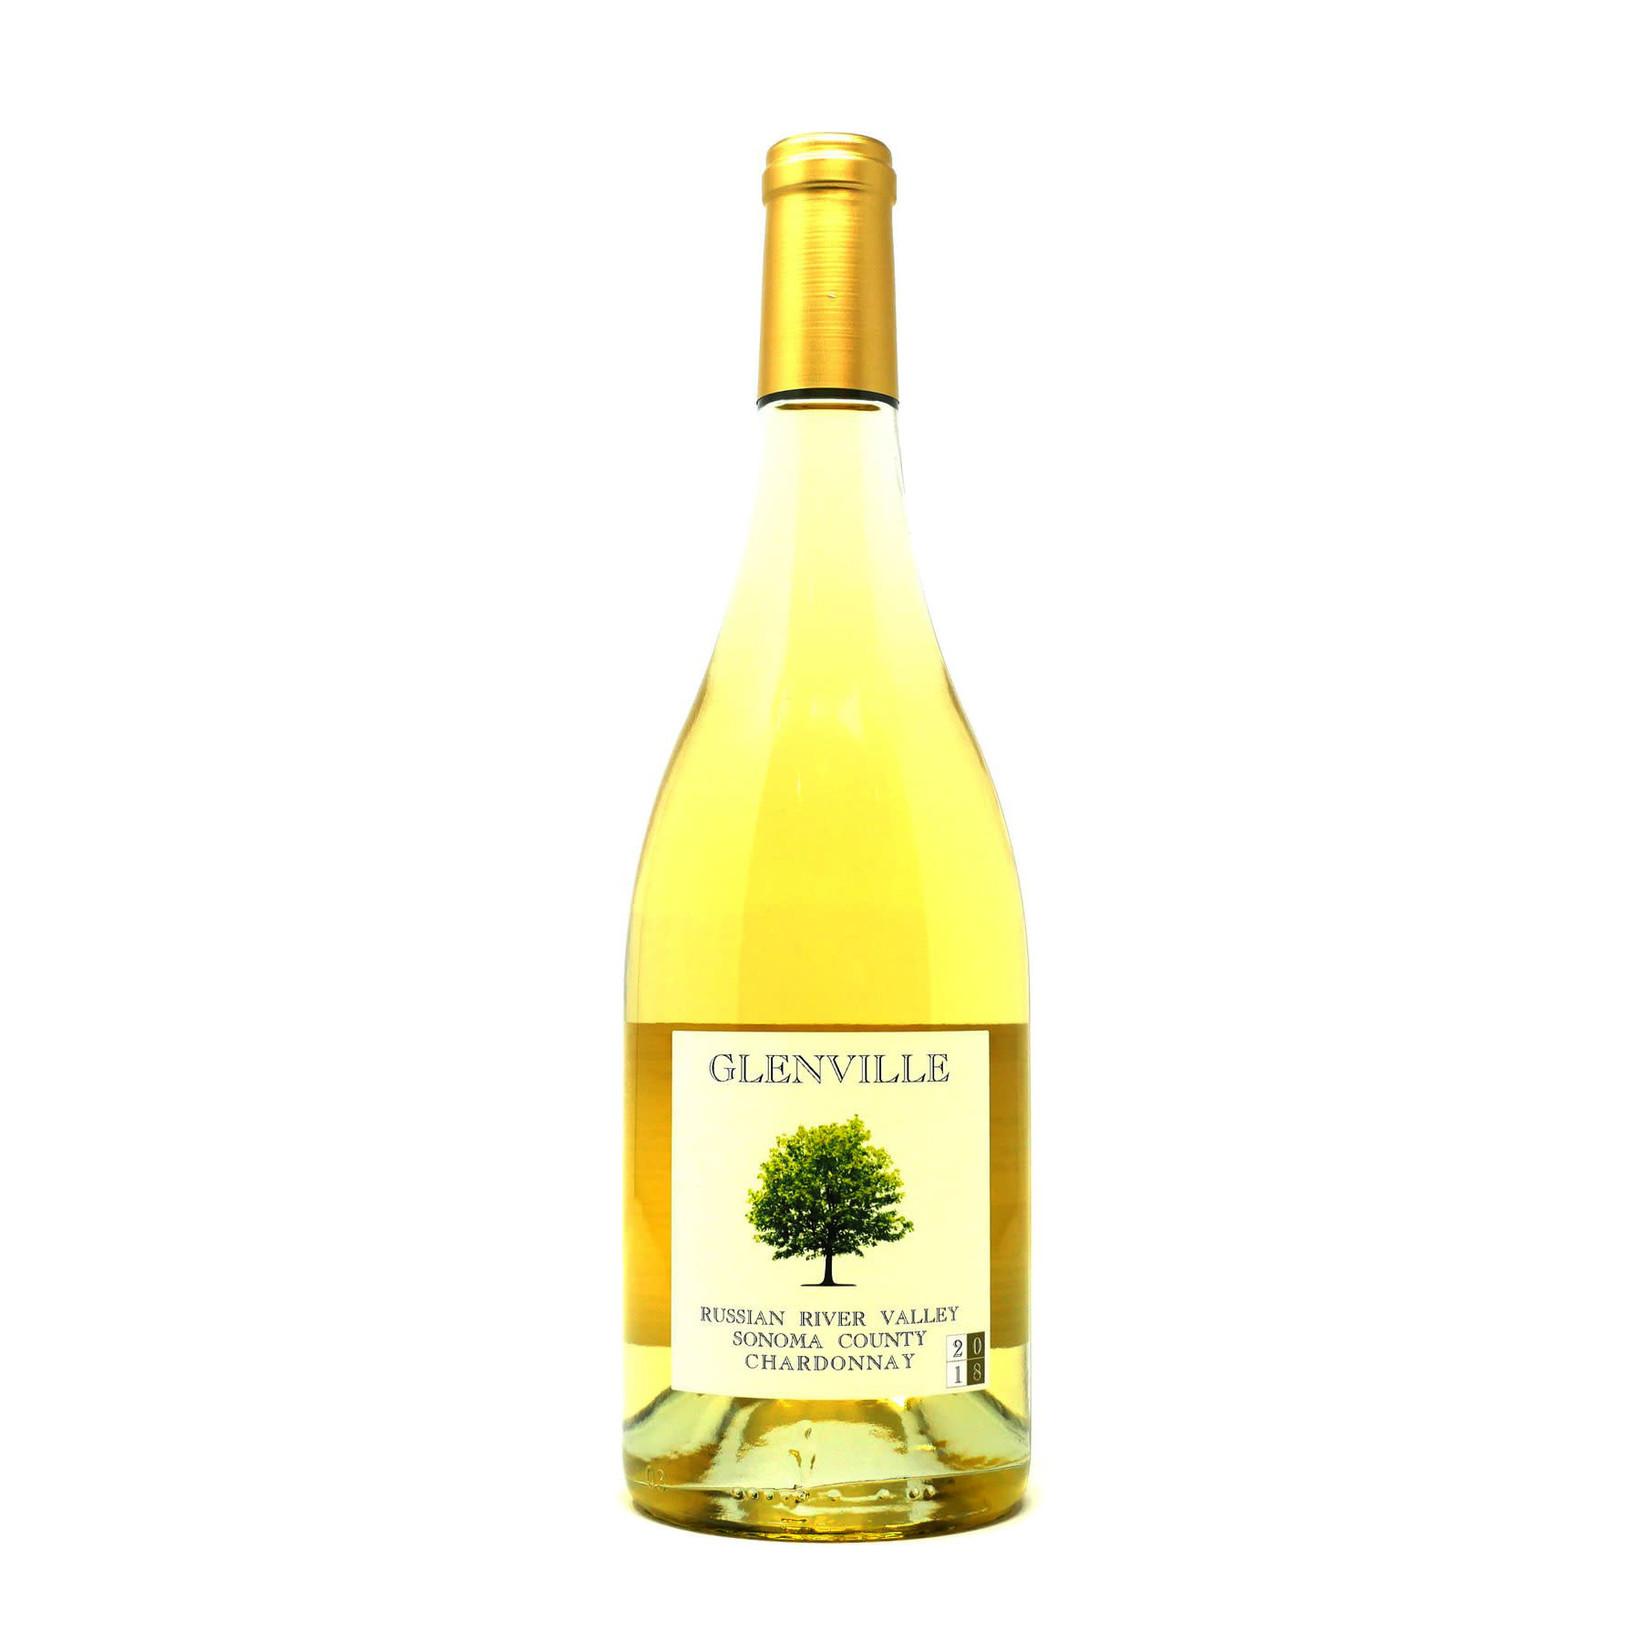 Wine Glenville Russian River Valley Chardonnay 2018